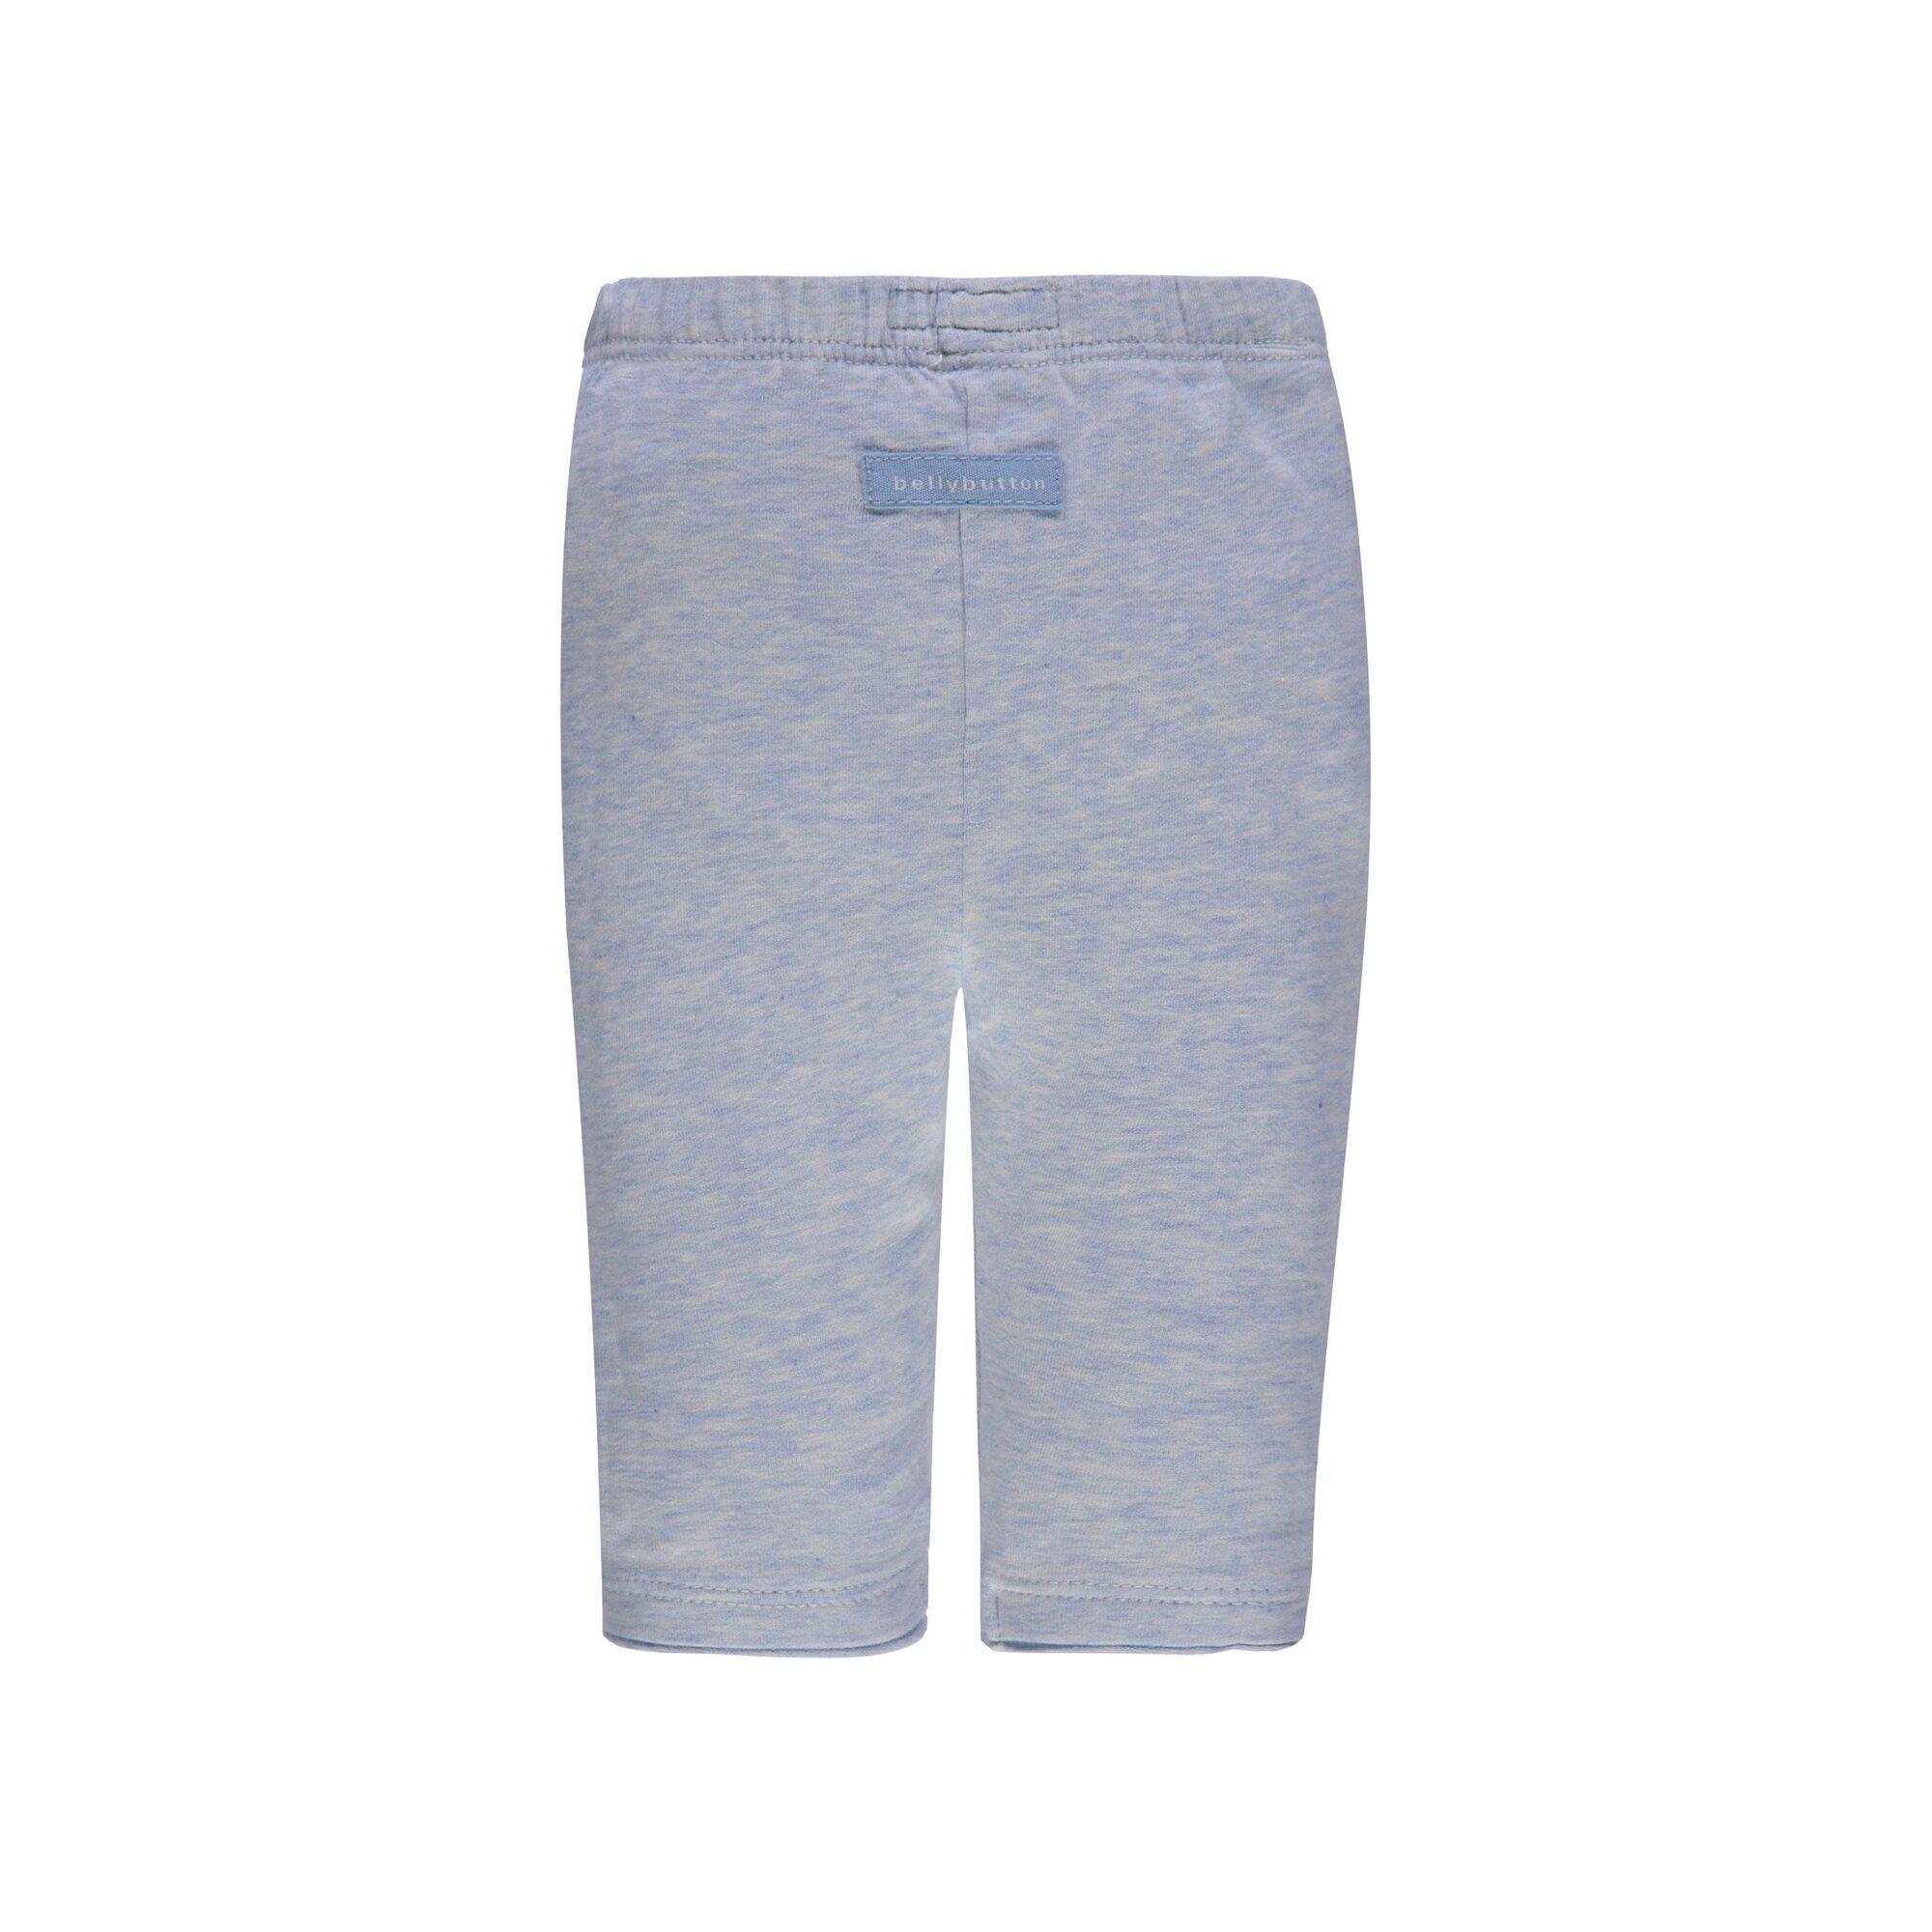 bellybutton-leggings, 15.95 EUR @ babywalz-de